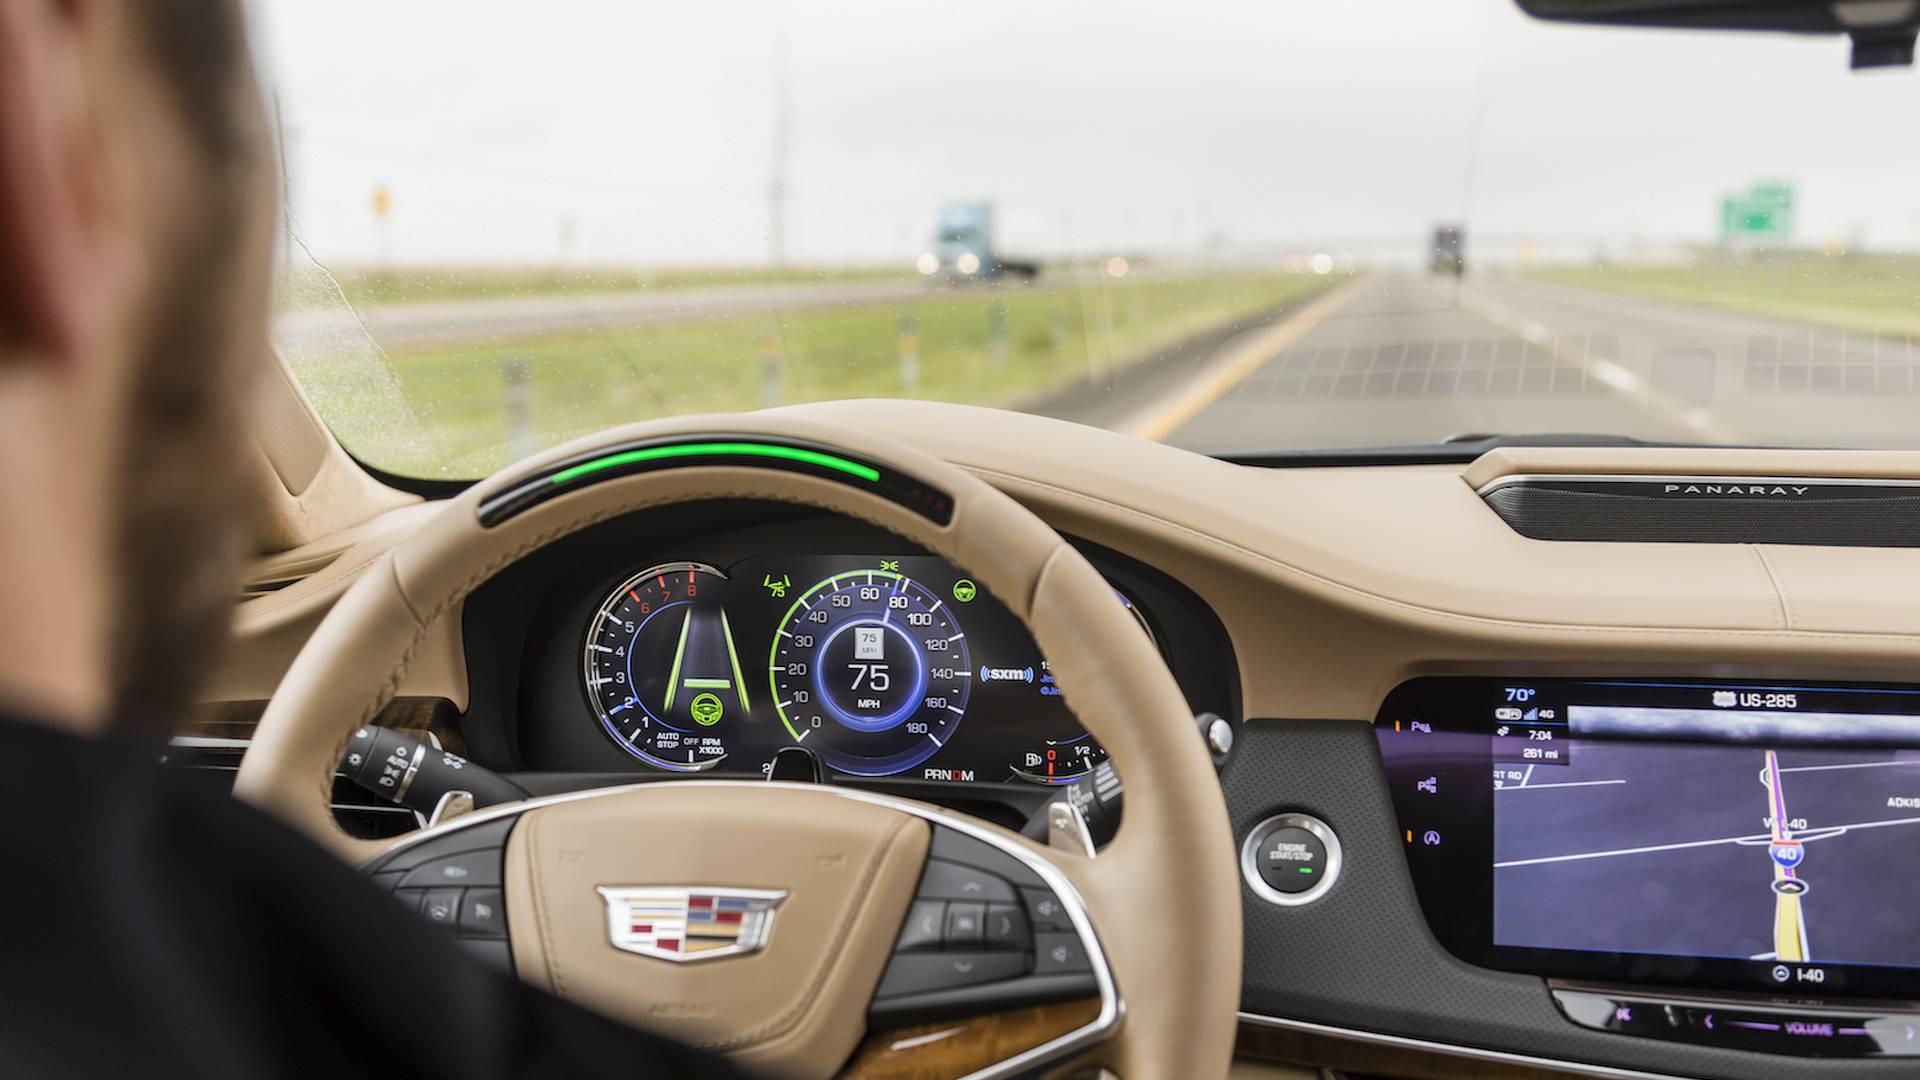 Consumer Reports Rates Cadillac Super Cruise Ahead Of Tesla Autopilot